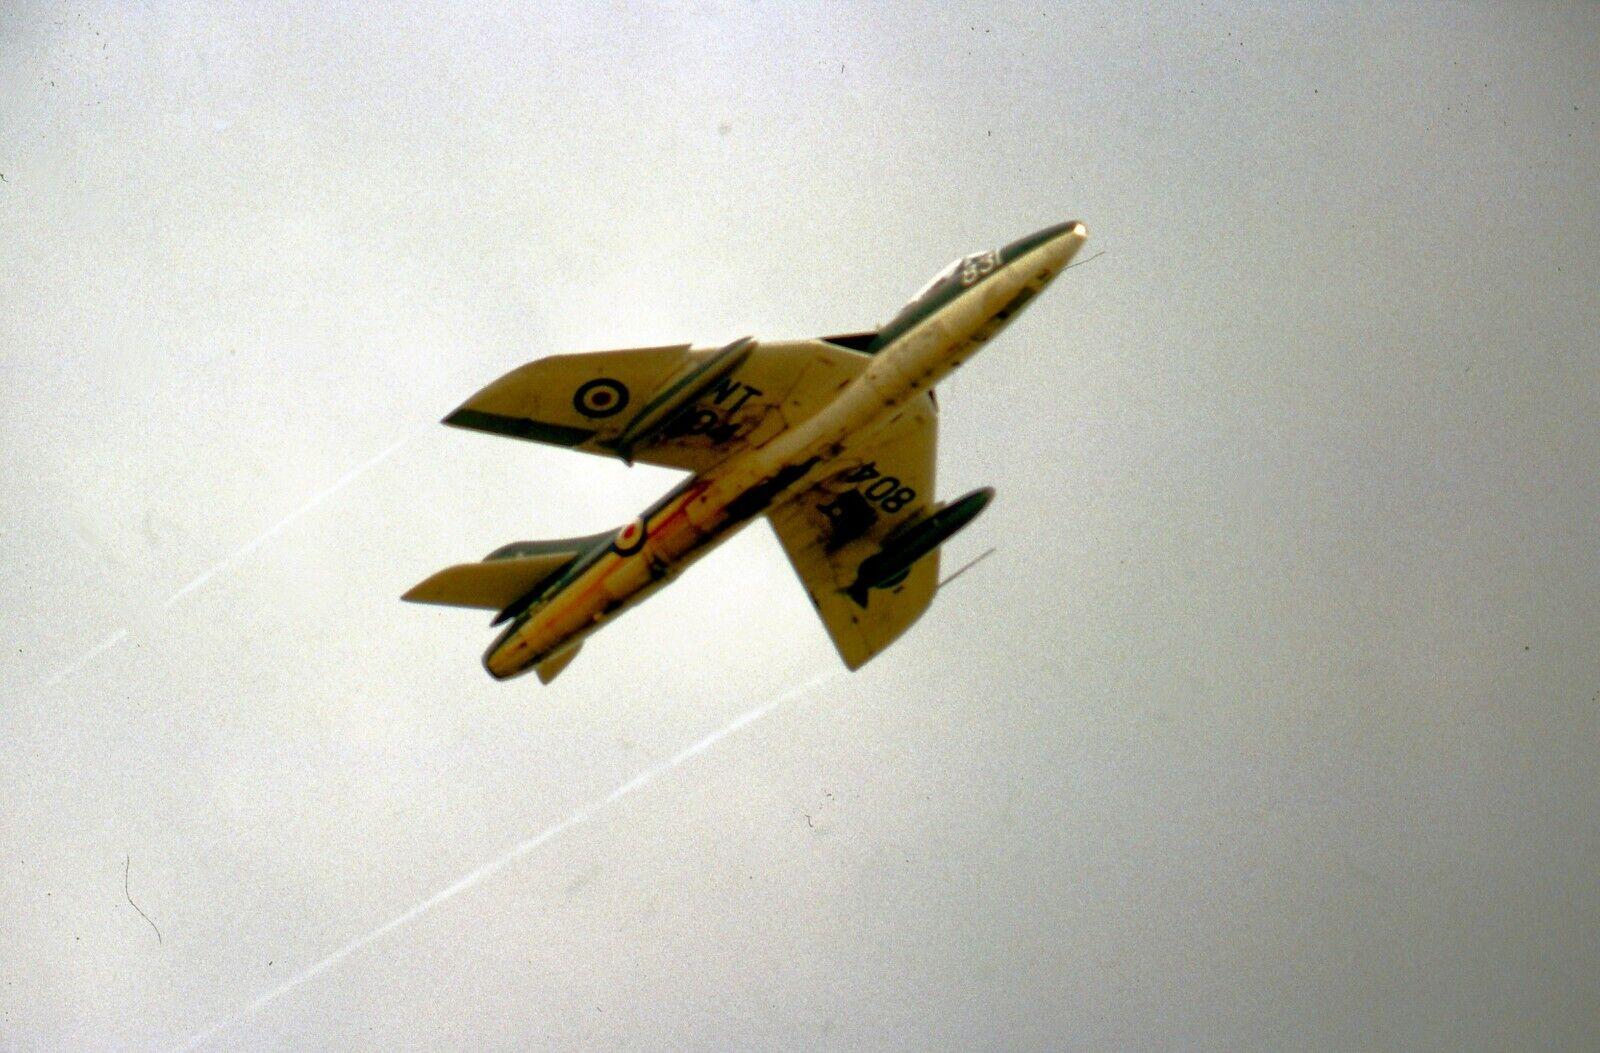 FLEET AIR ARM Hawker Hunter WT804 OF 738 NAS    Photo Print EXCLUSIVE